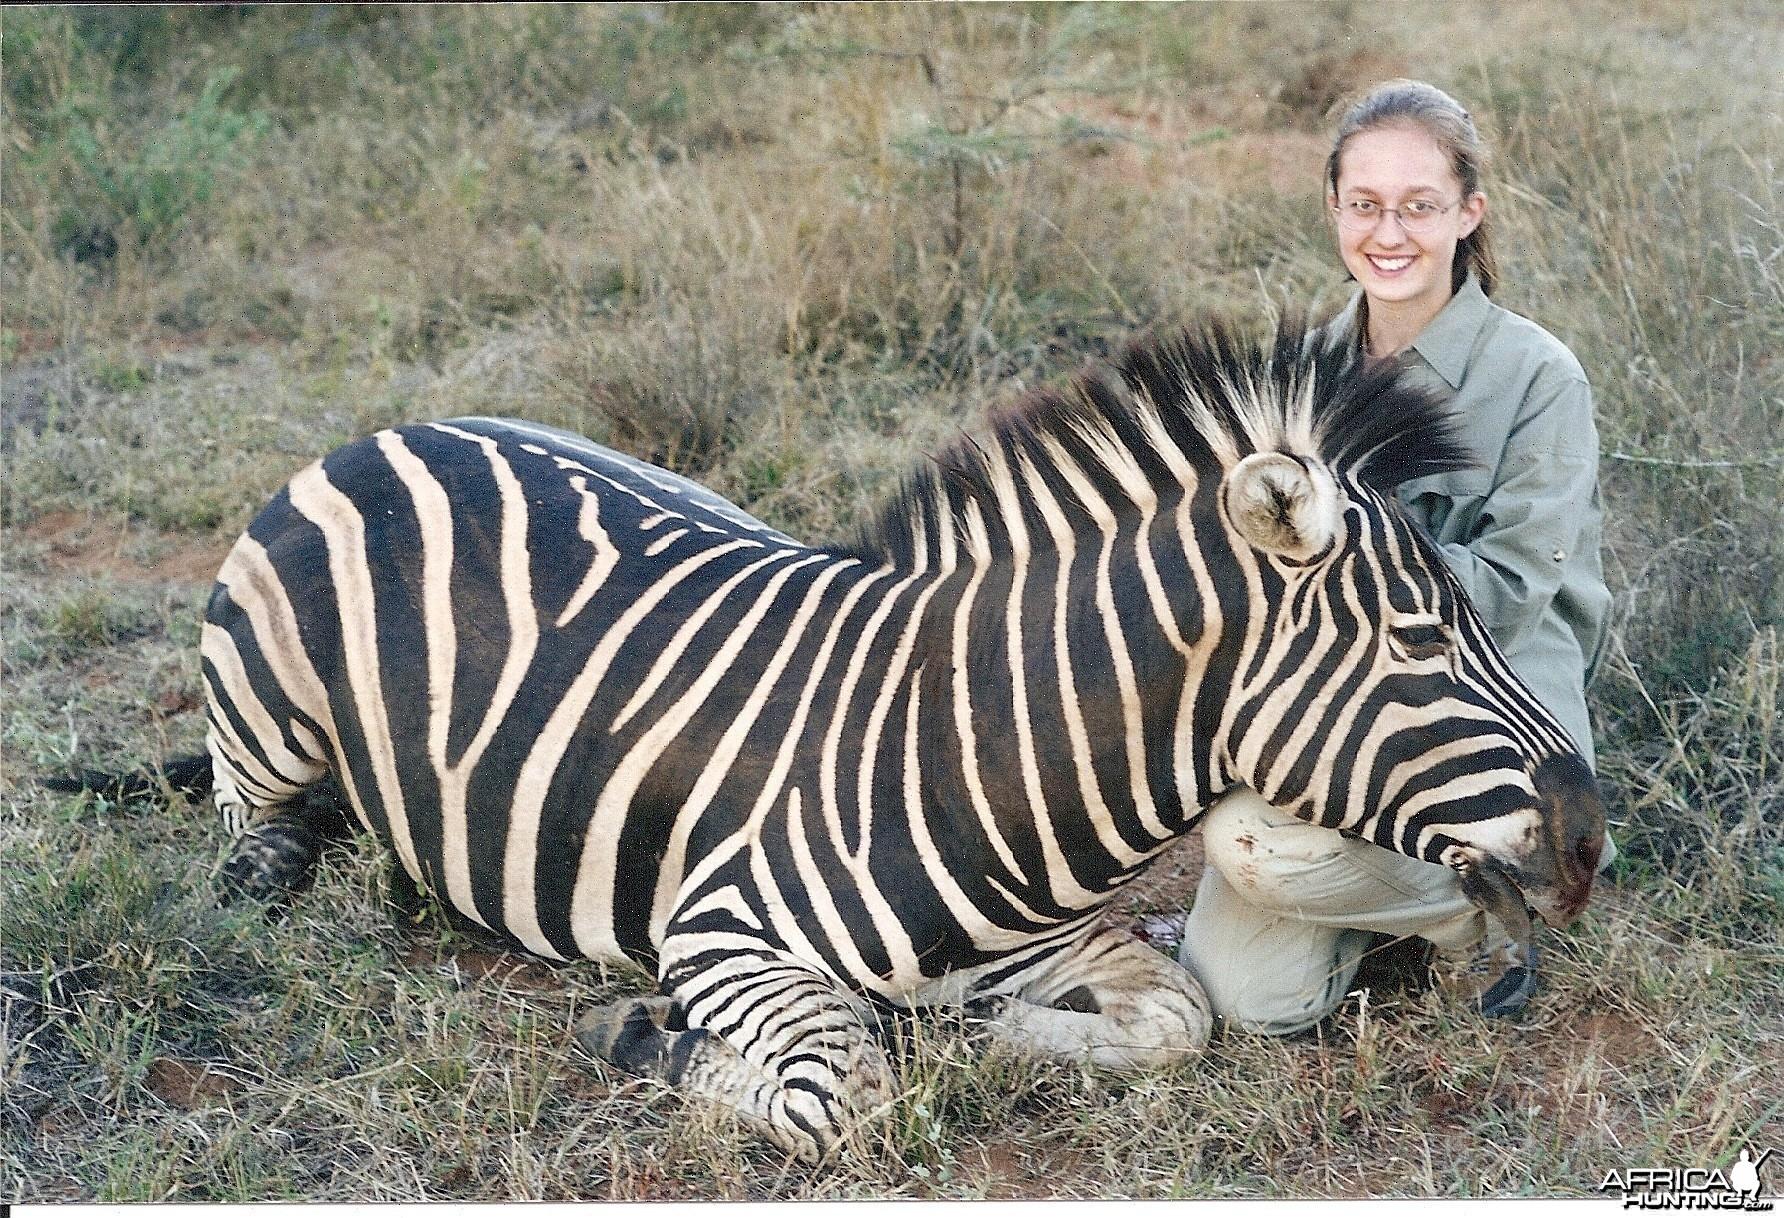 Becky & Zebra